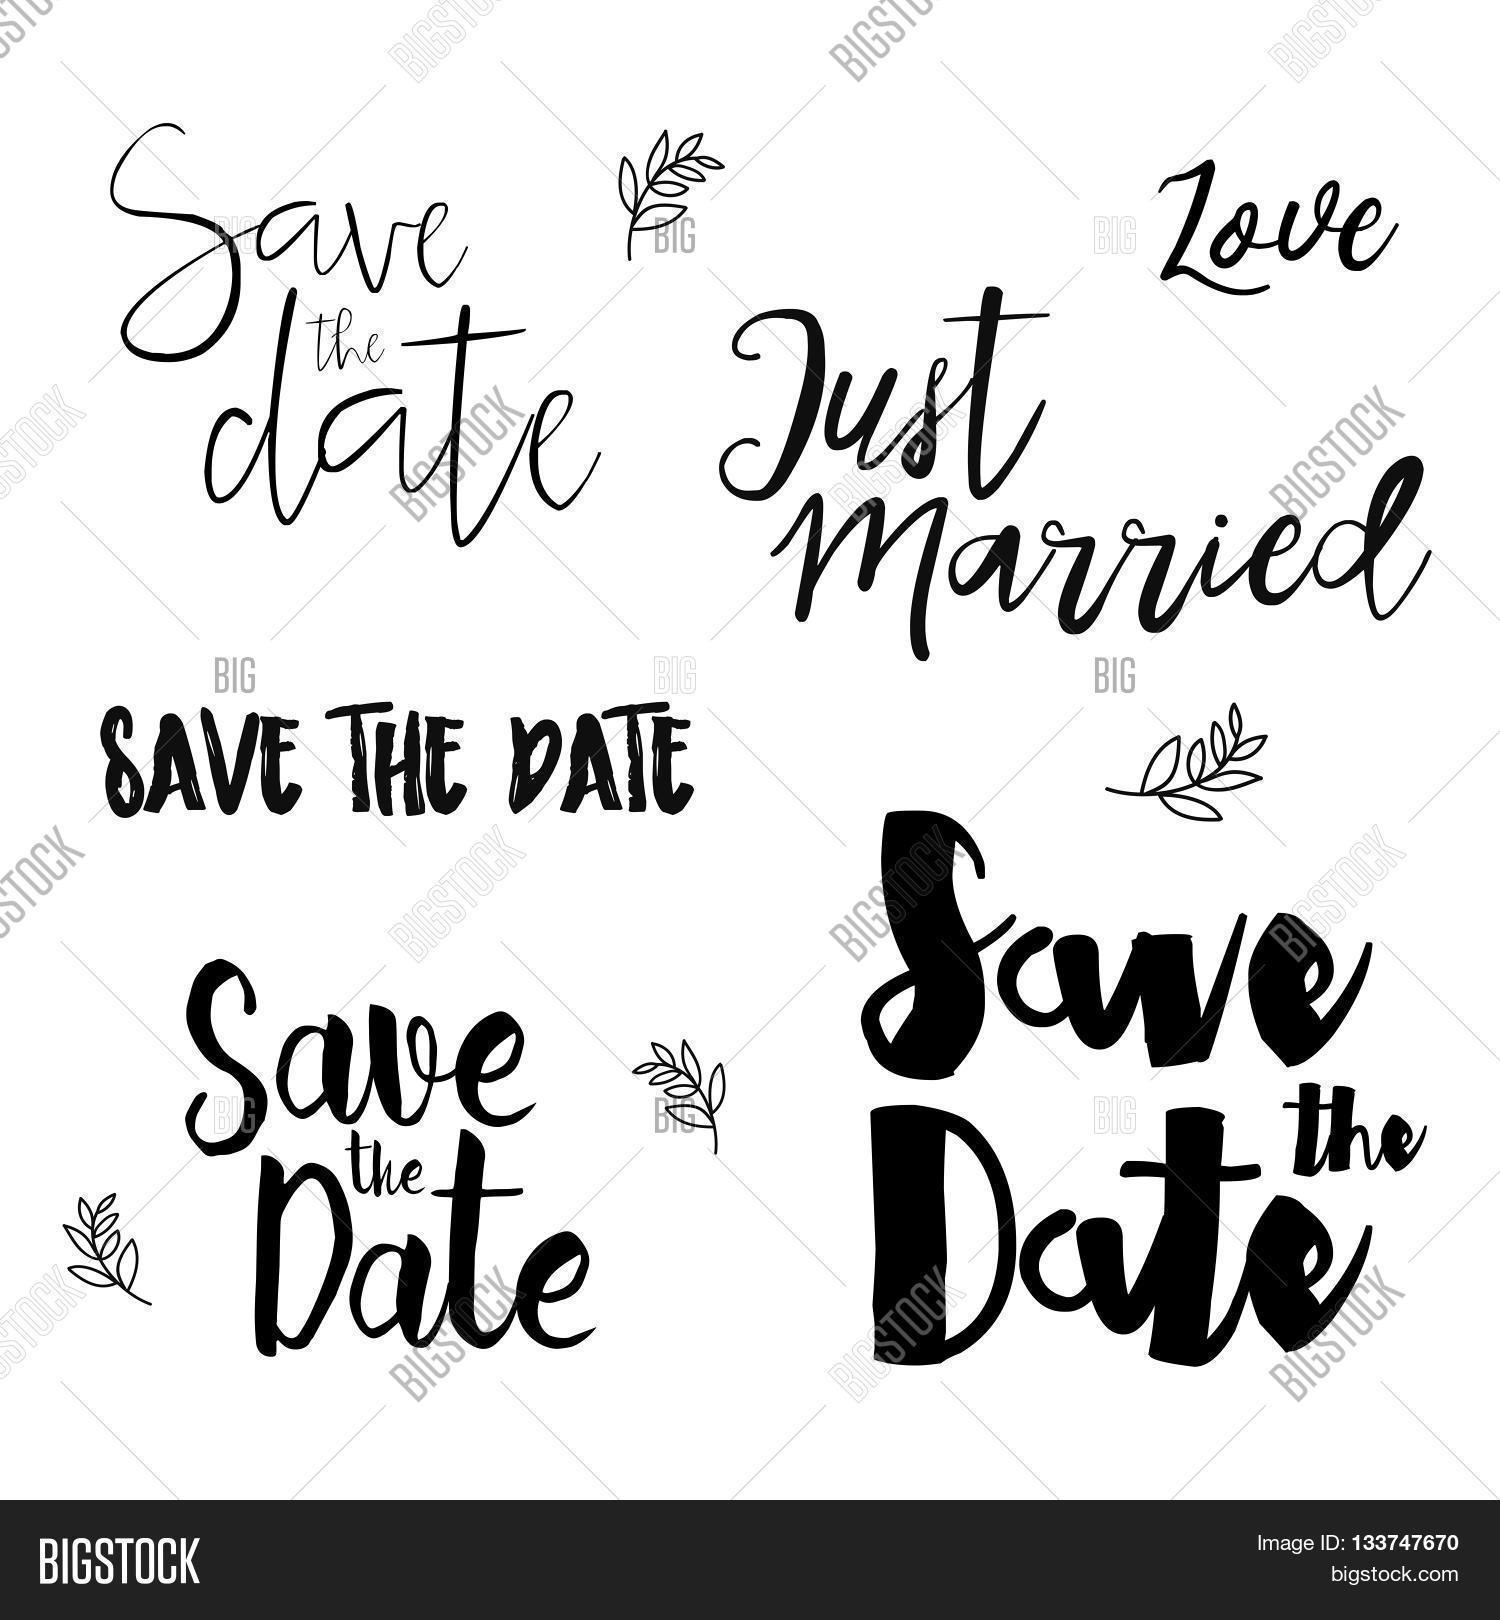 Save Date Wedding Vector & Photo (Free Trial) | Bigstock